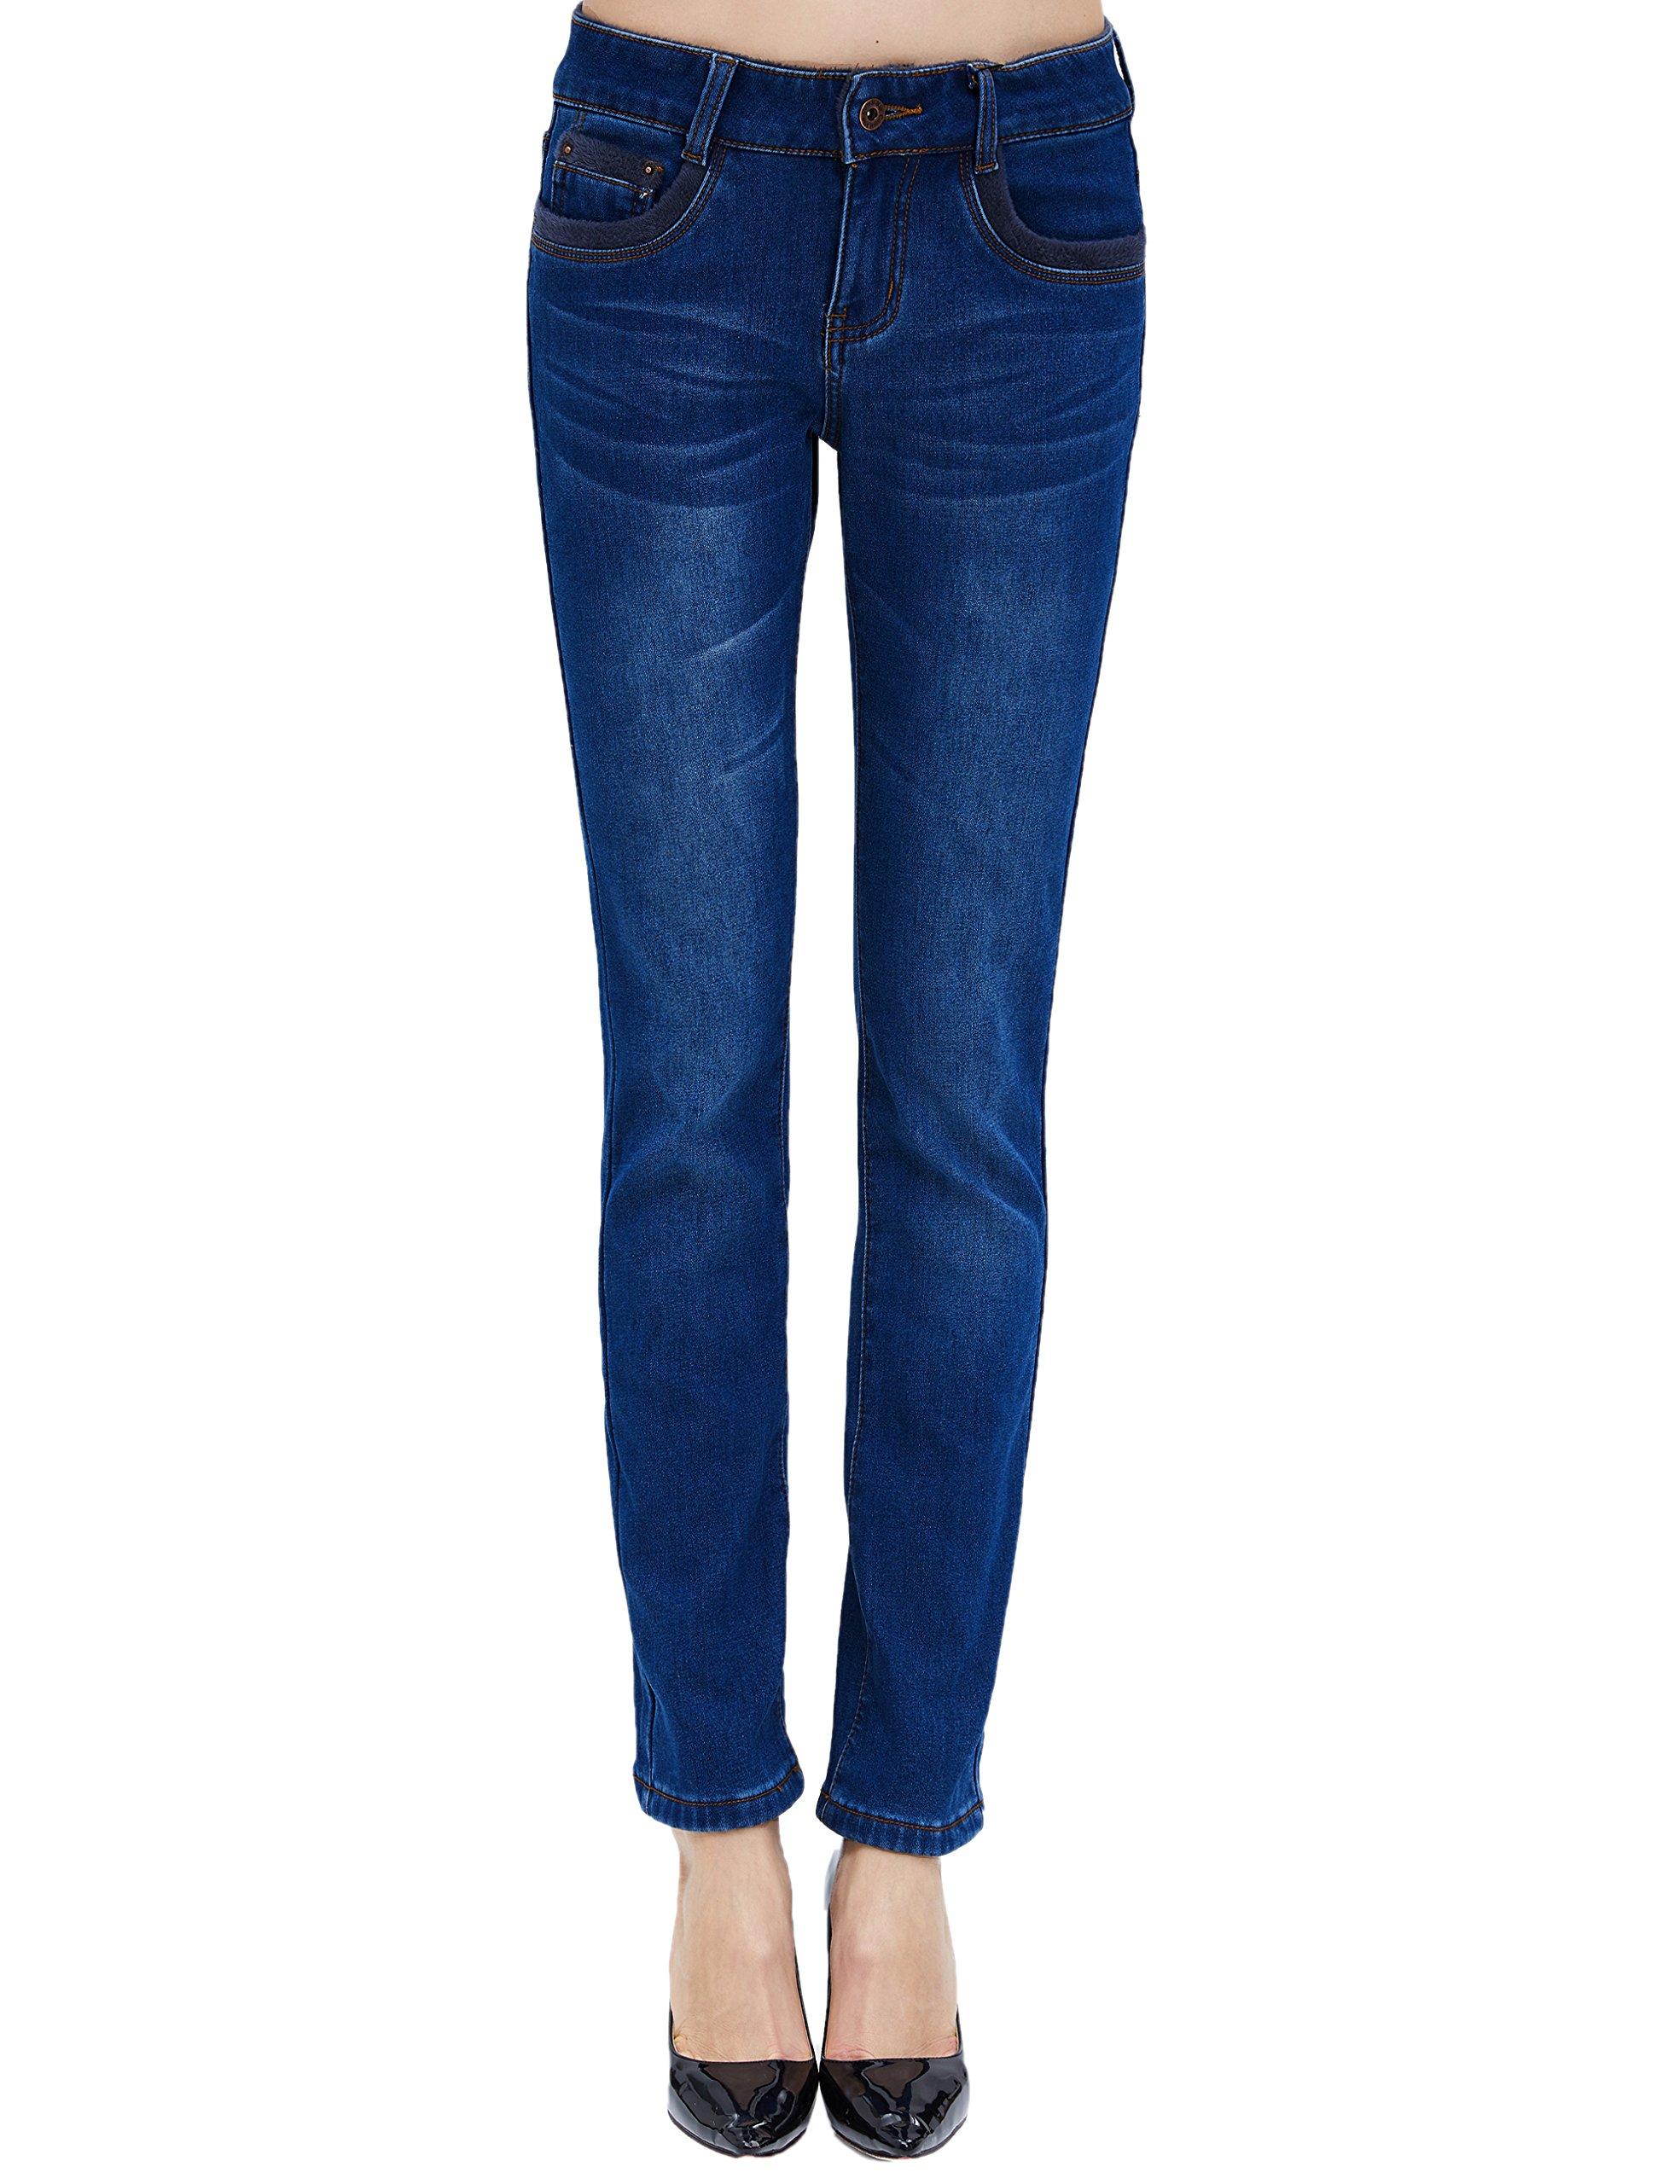 Camii Mia Women's Winter Slim Fit Thermal Jeans Pants (W29 x L30, Blue (New Size))